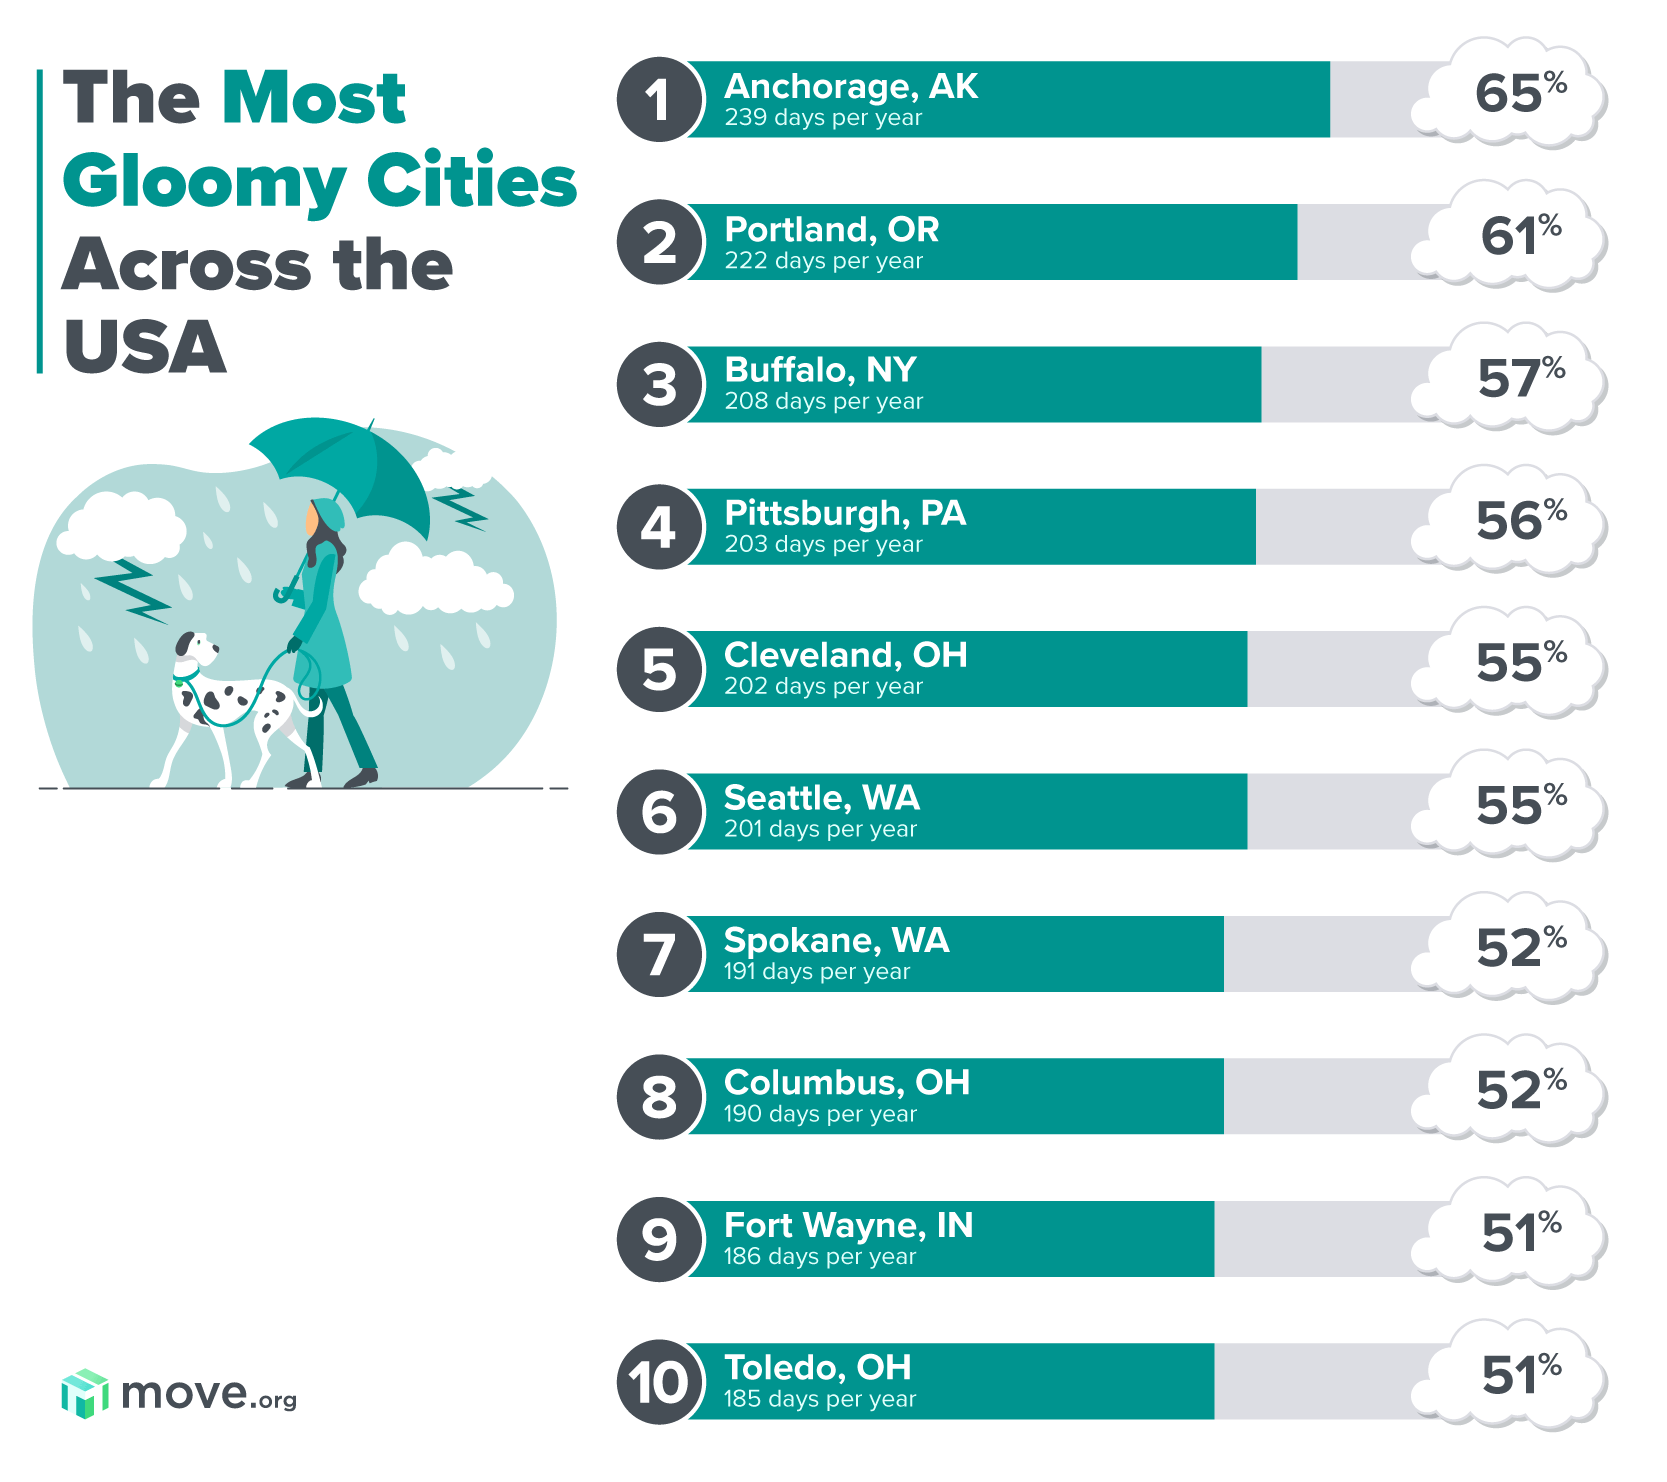 Gloomiest cities in the US